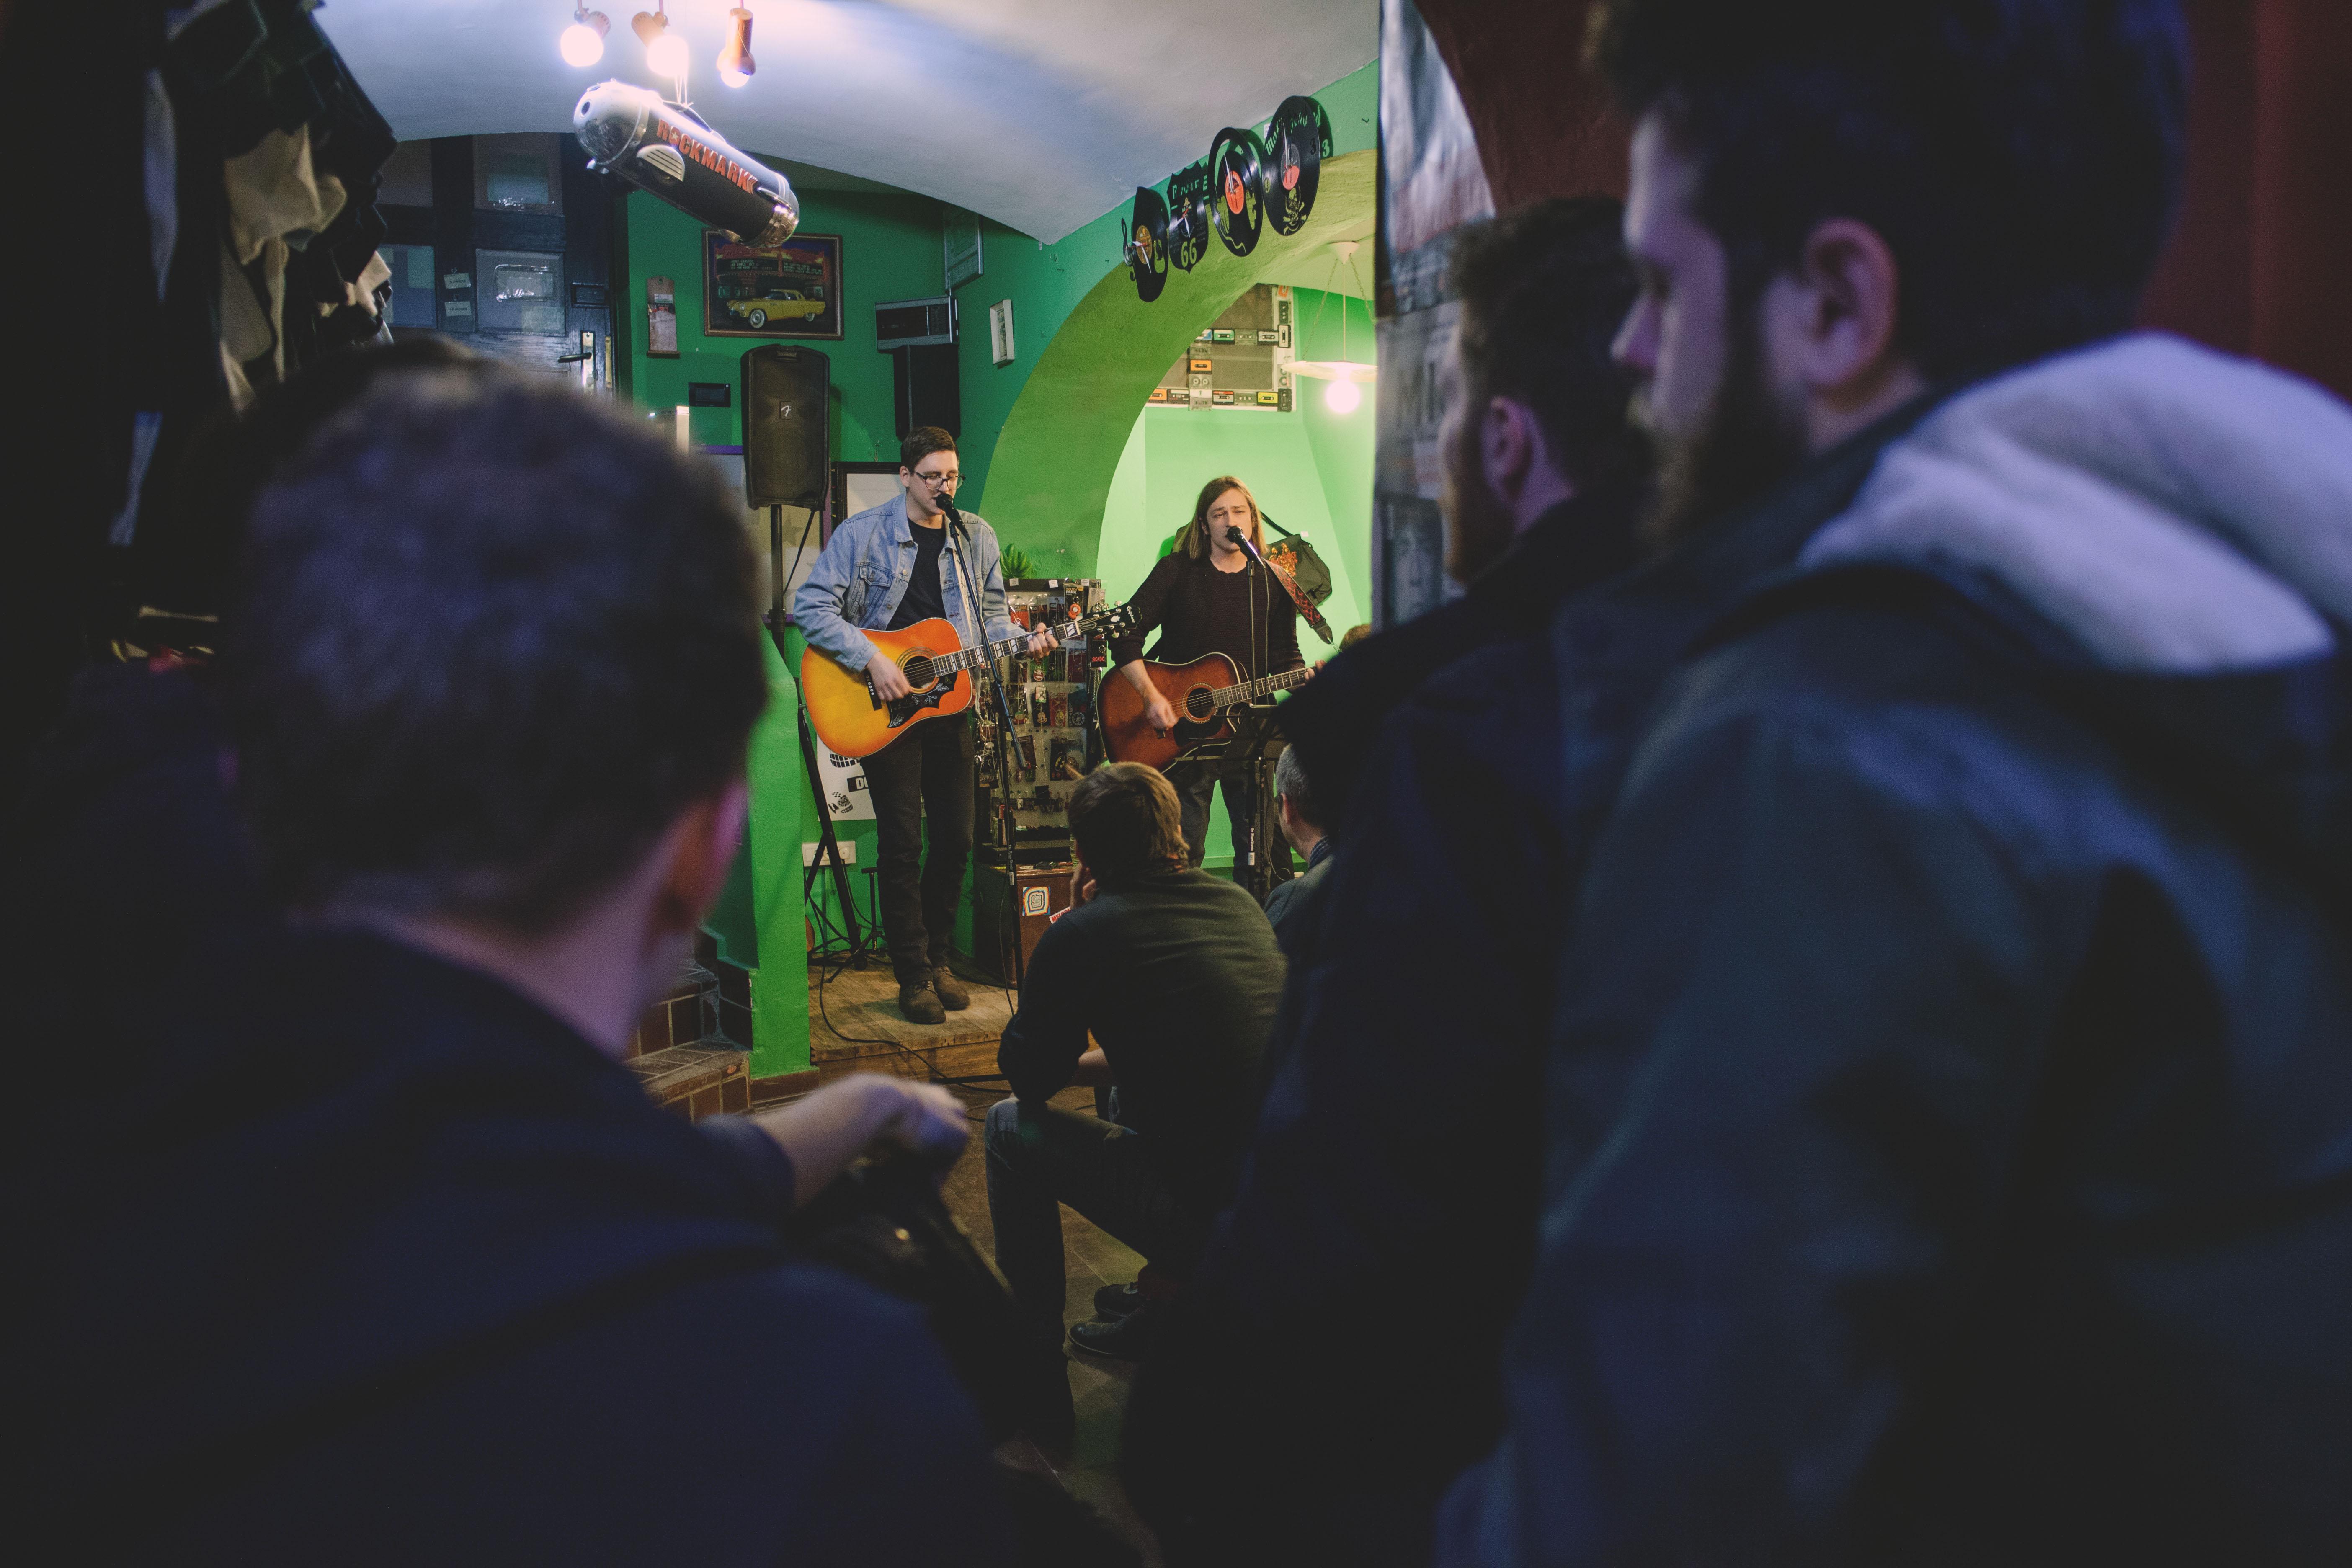 Široke Ulice (Akustika, Rockmark)